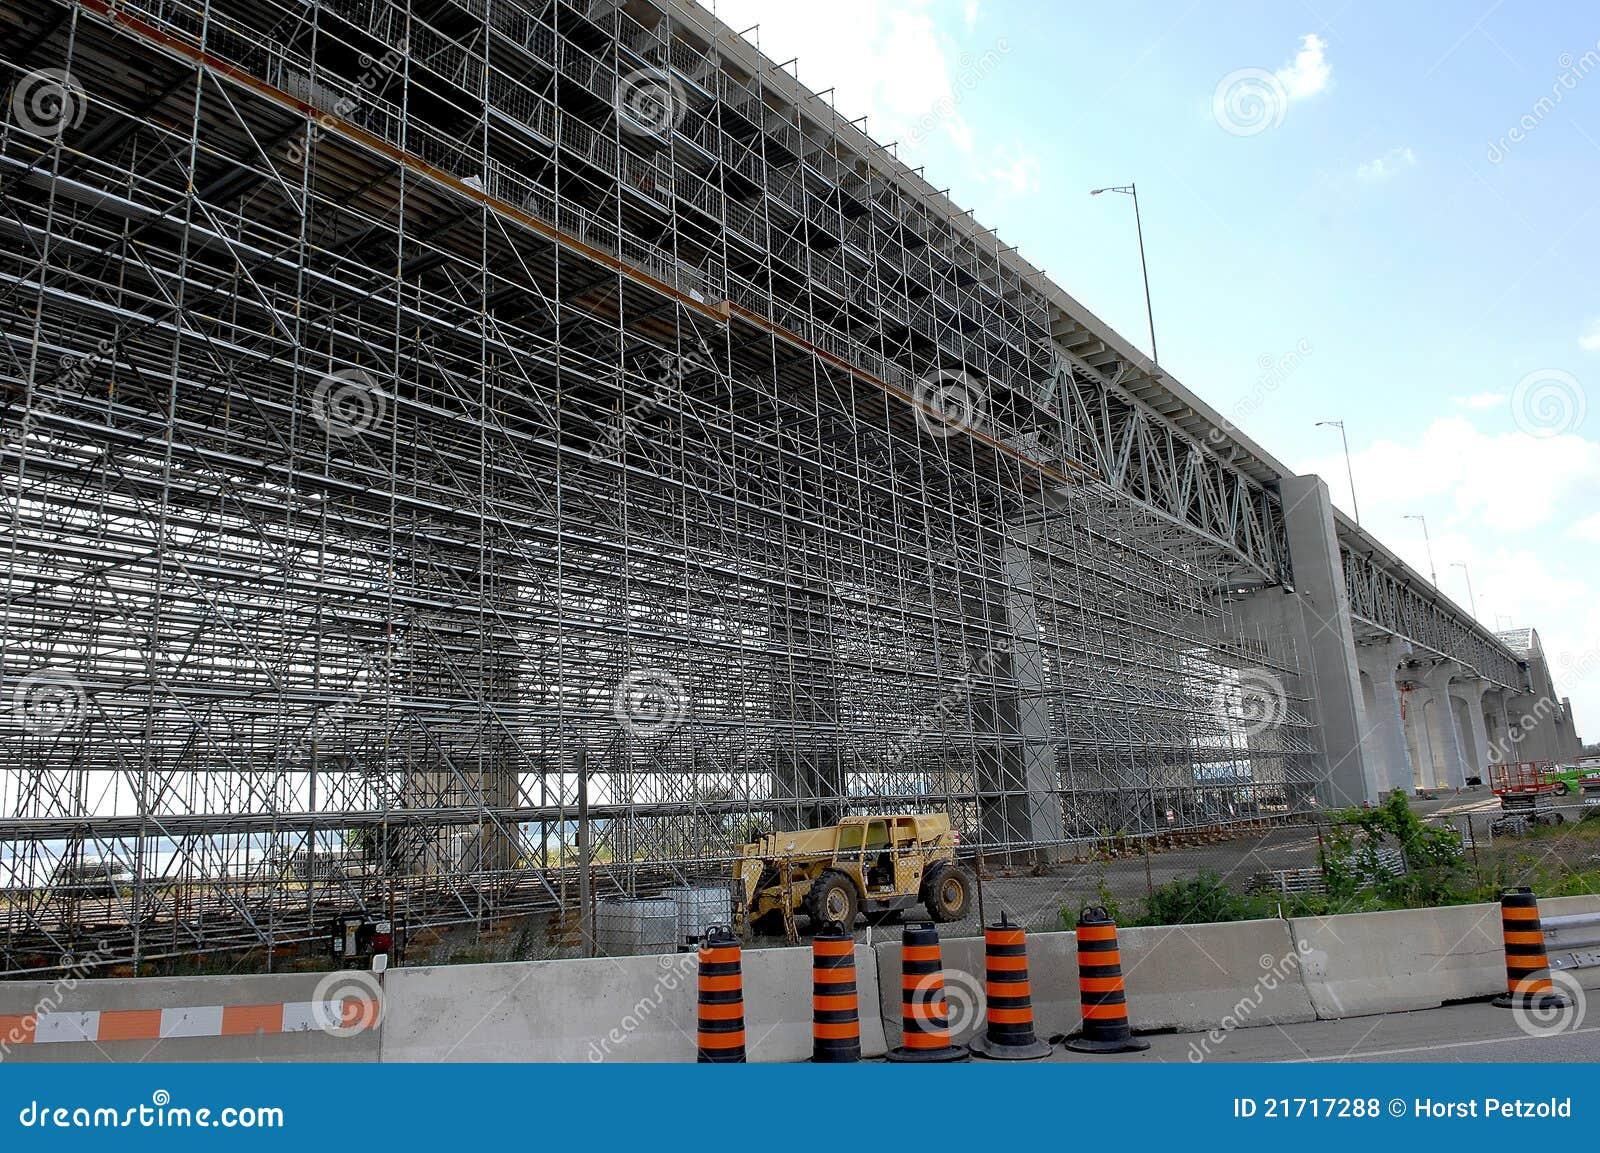 Bridge Repair With Scaffolding  Stock Photo - Image of link